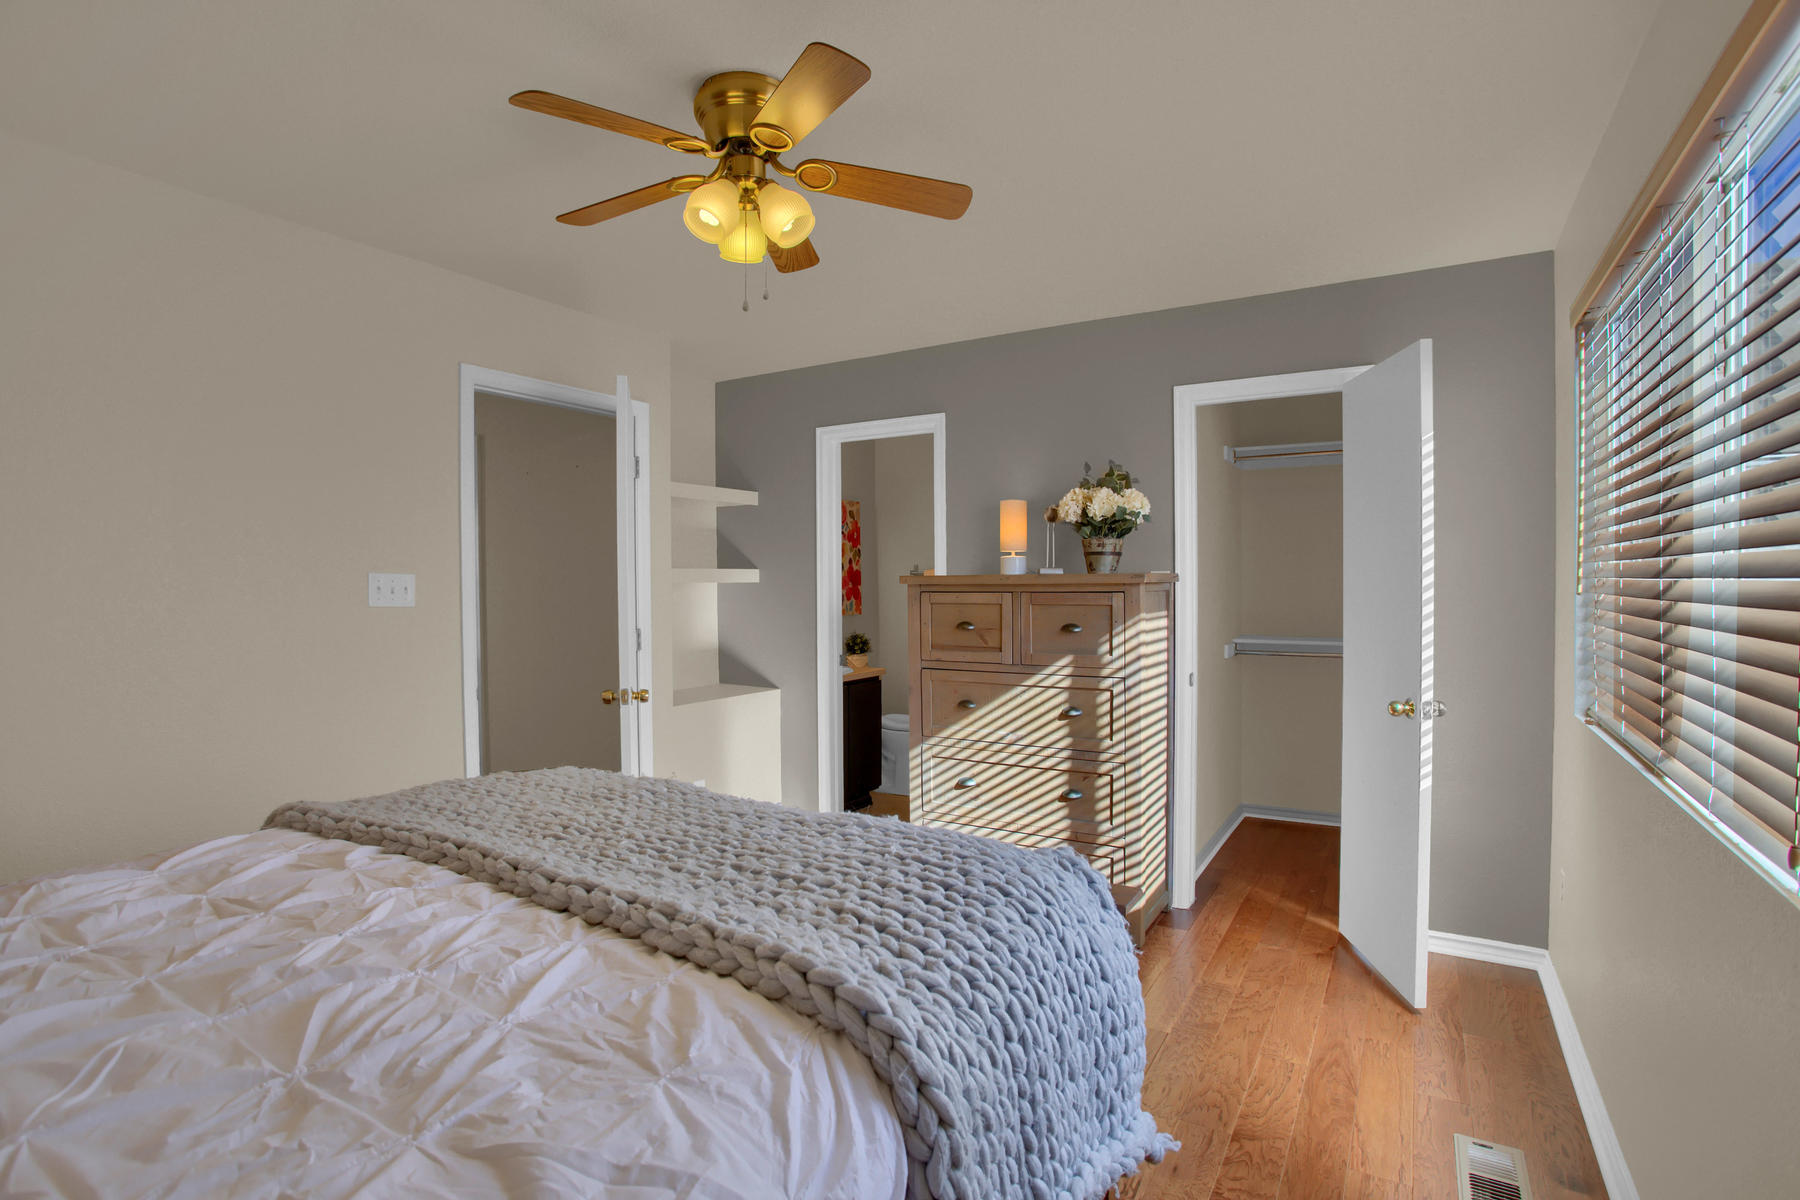 11662 Oakland Dr Commerce City-016-16-Bedroom-MLS_Size.jpg